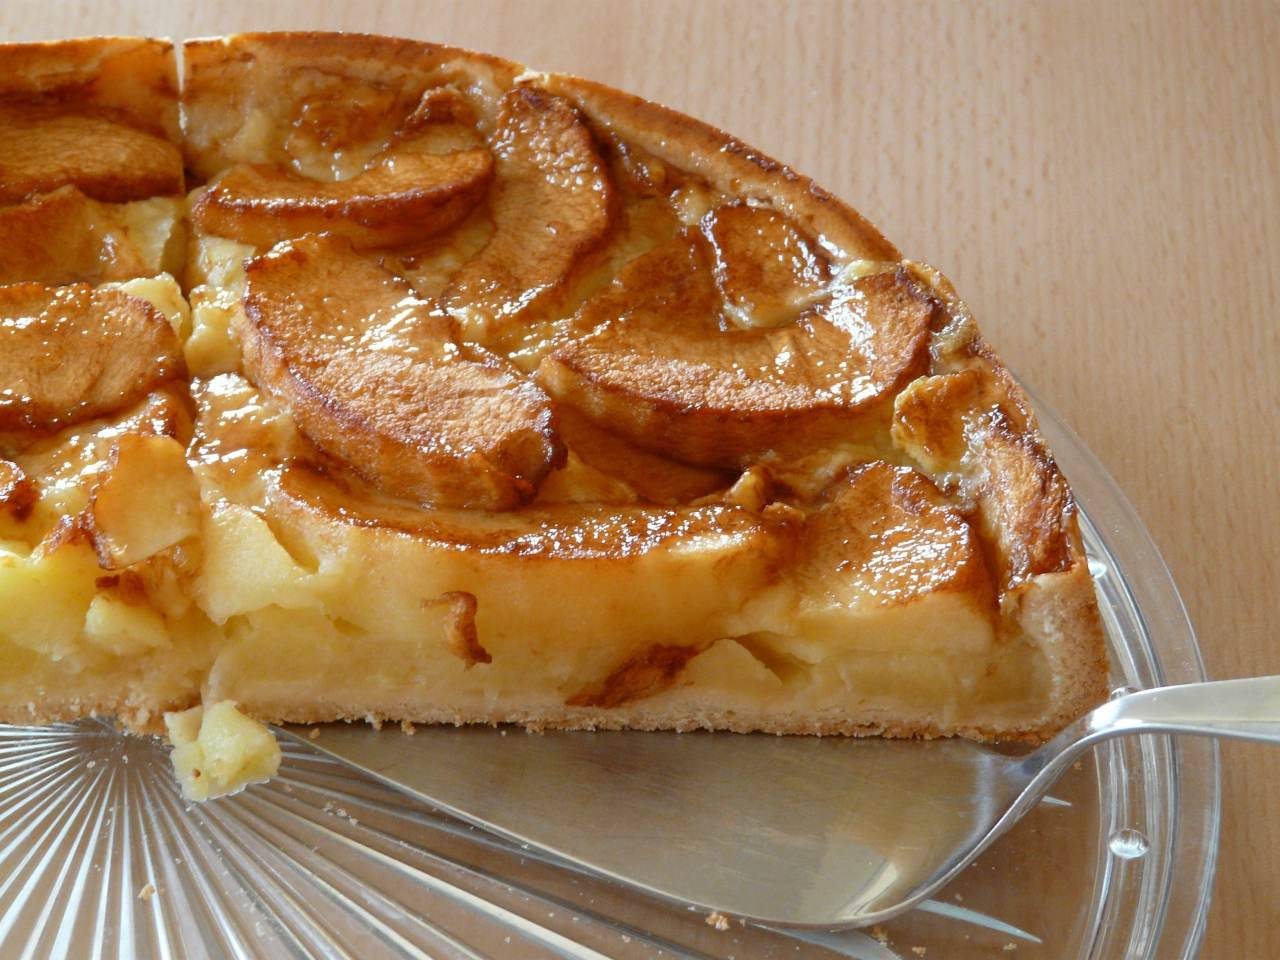 Torta di mele: unisci così gli ingredienti e sarà incredibilmente golosa(Fonte foto: Pixabay)